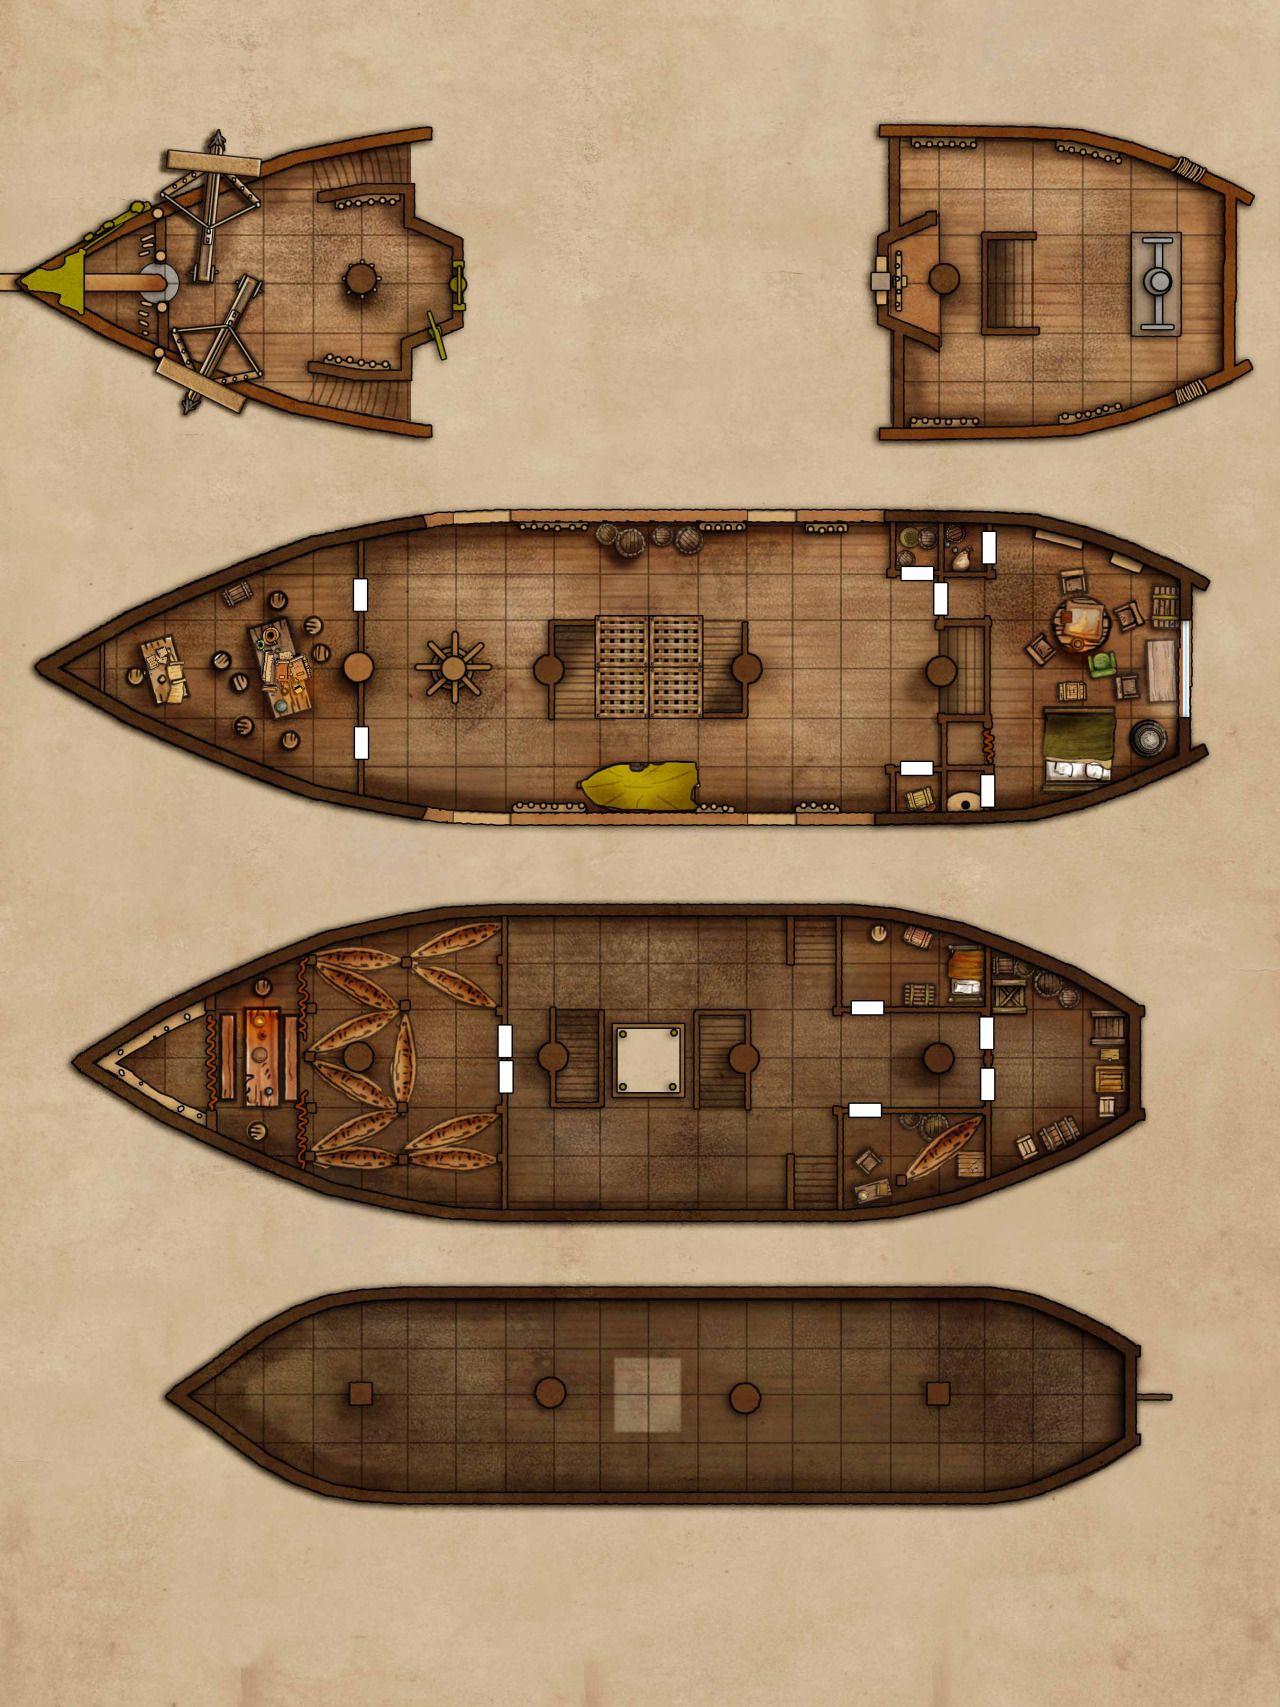 Fantasy maps by robert lazzaretti dd fantasy maps by robert lazzaretti malvernweather Choice Image